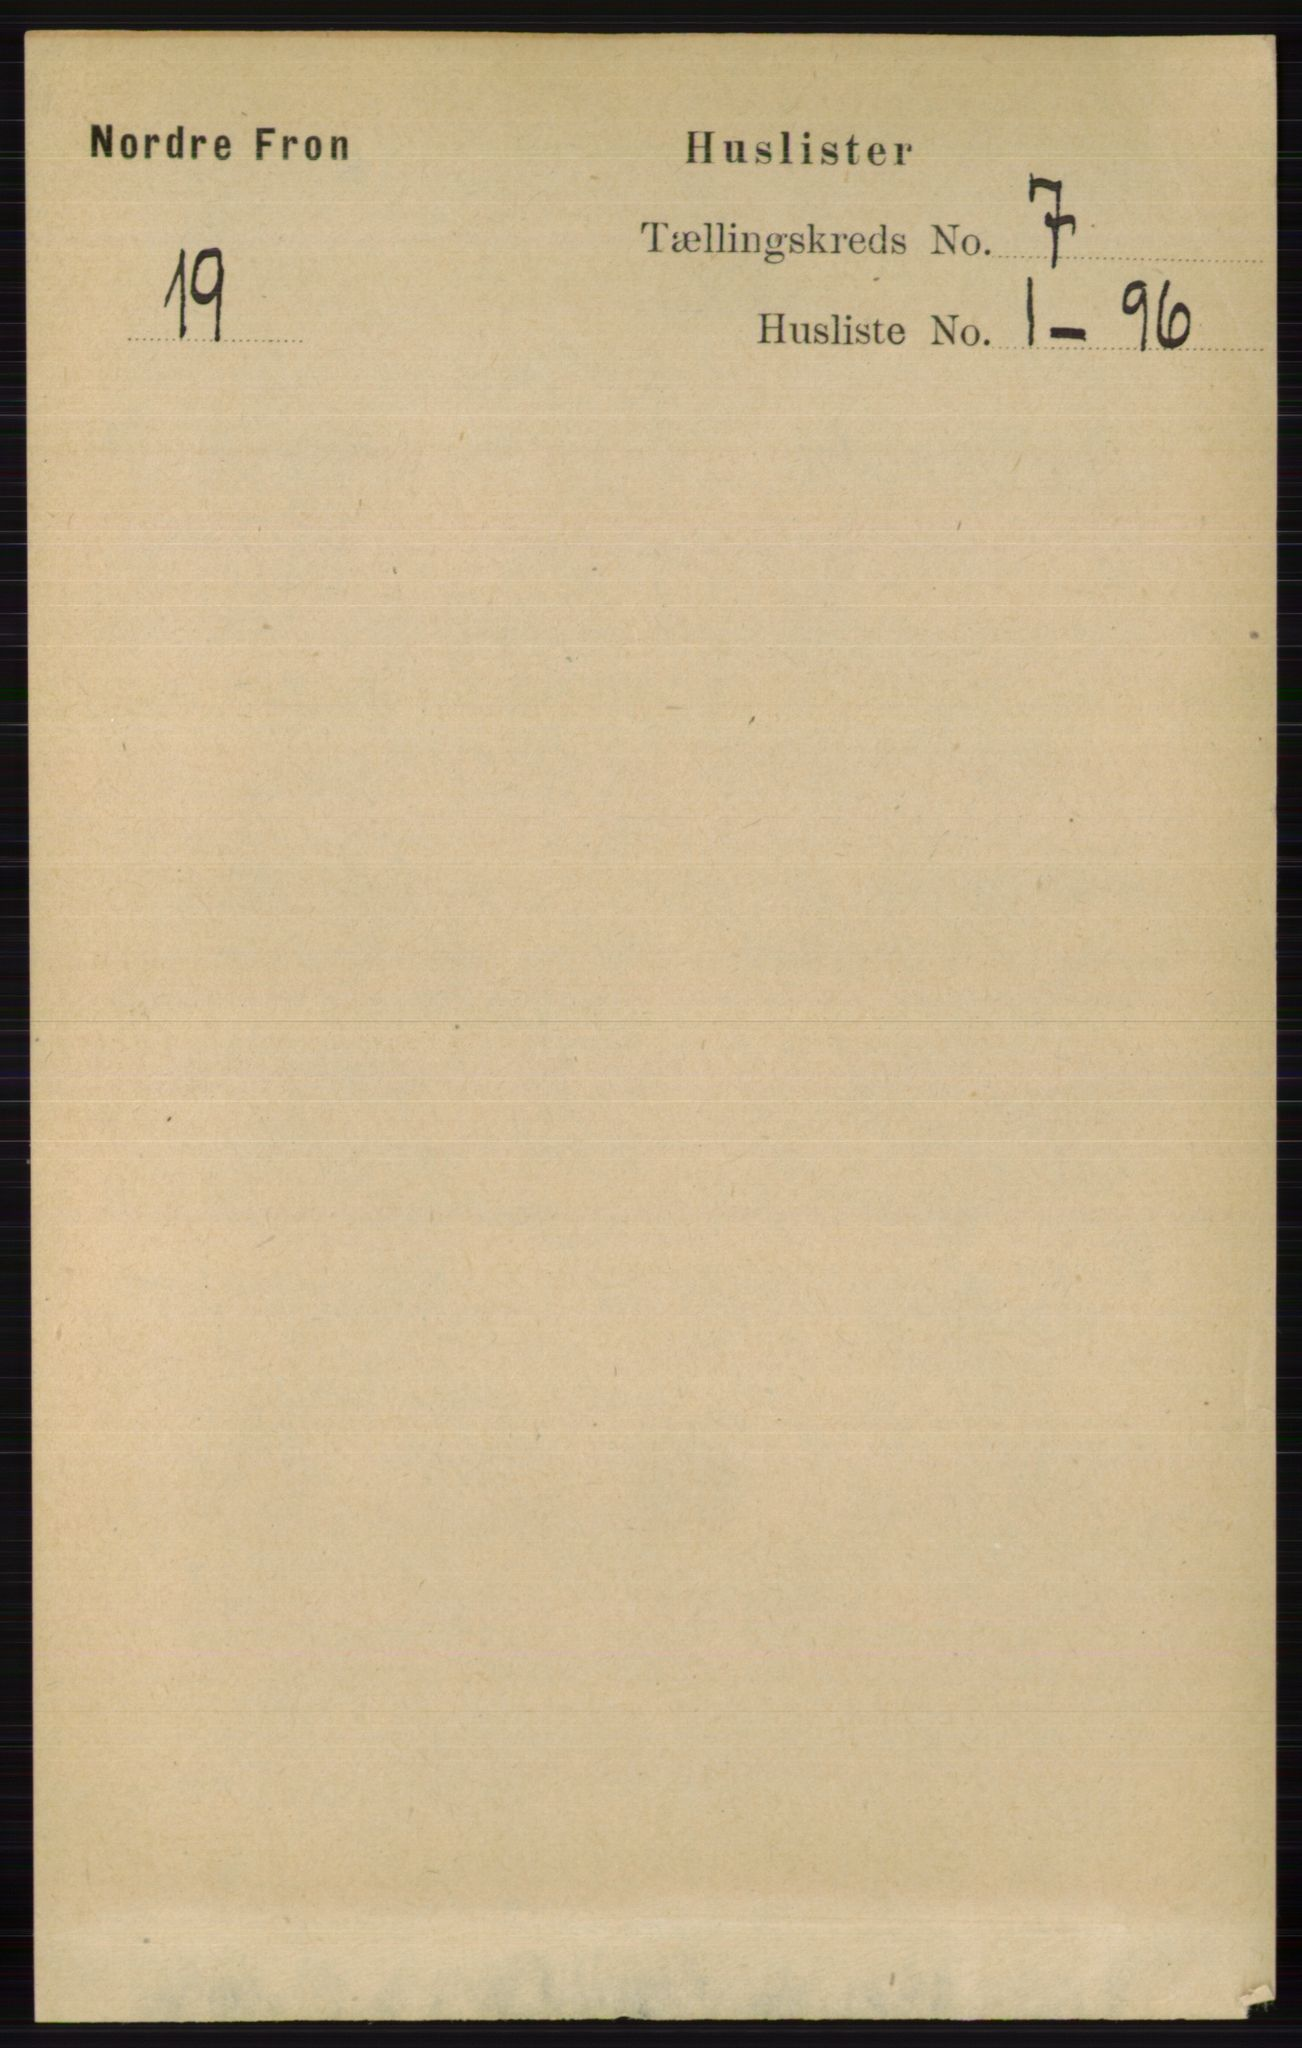 RA, Folketelling 1891 for 0518 Nord-Fron herred, 1891, s. 2733